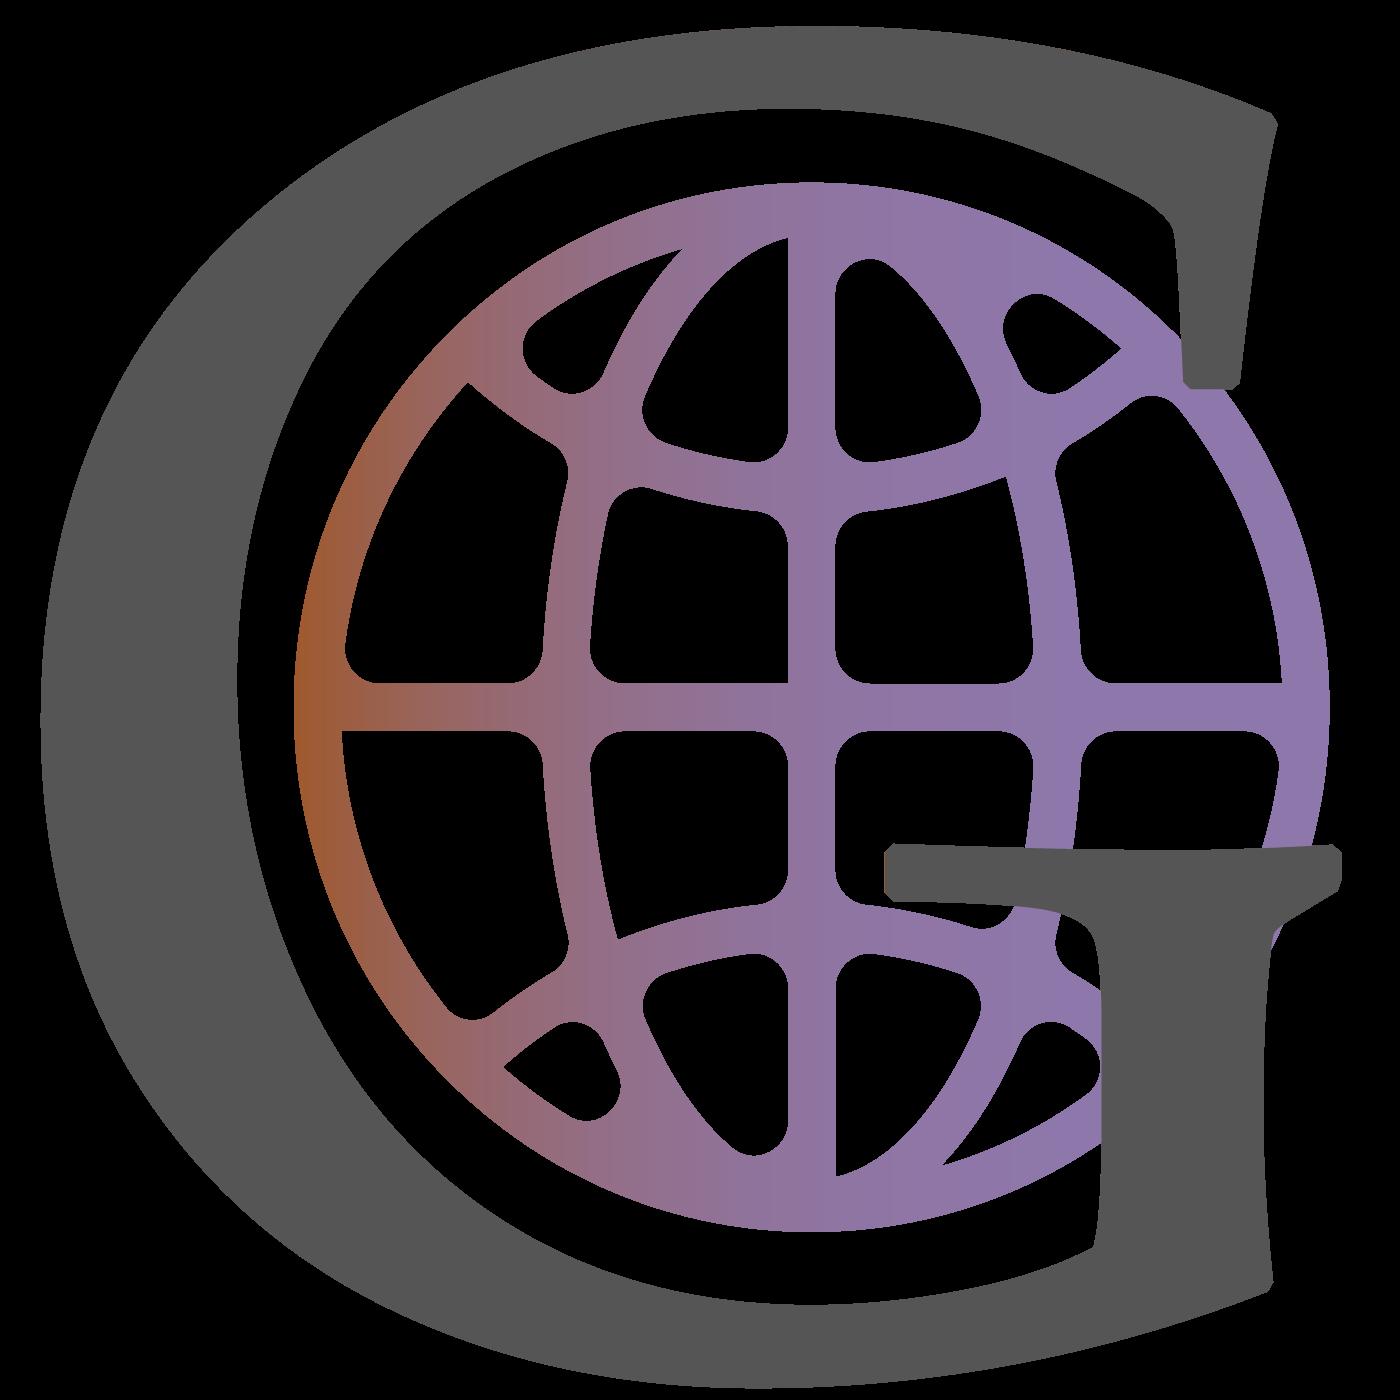 L'agence Web La Région du Web